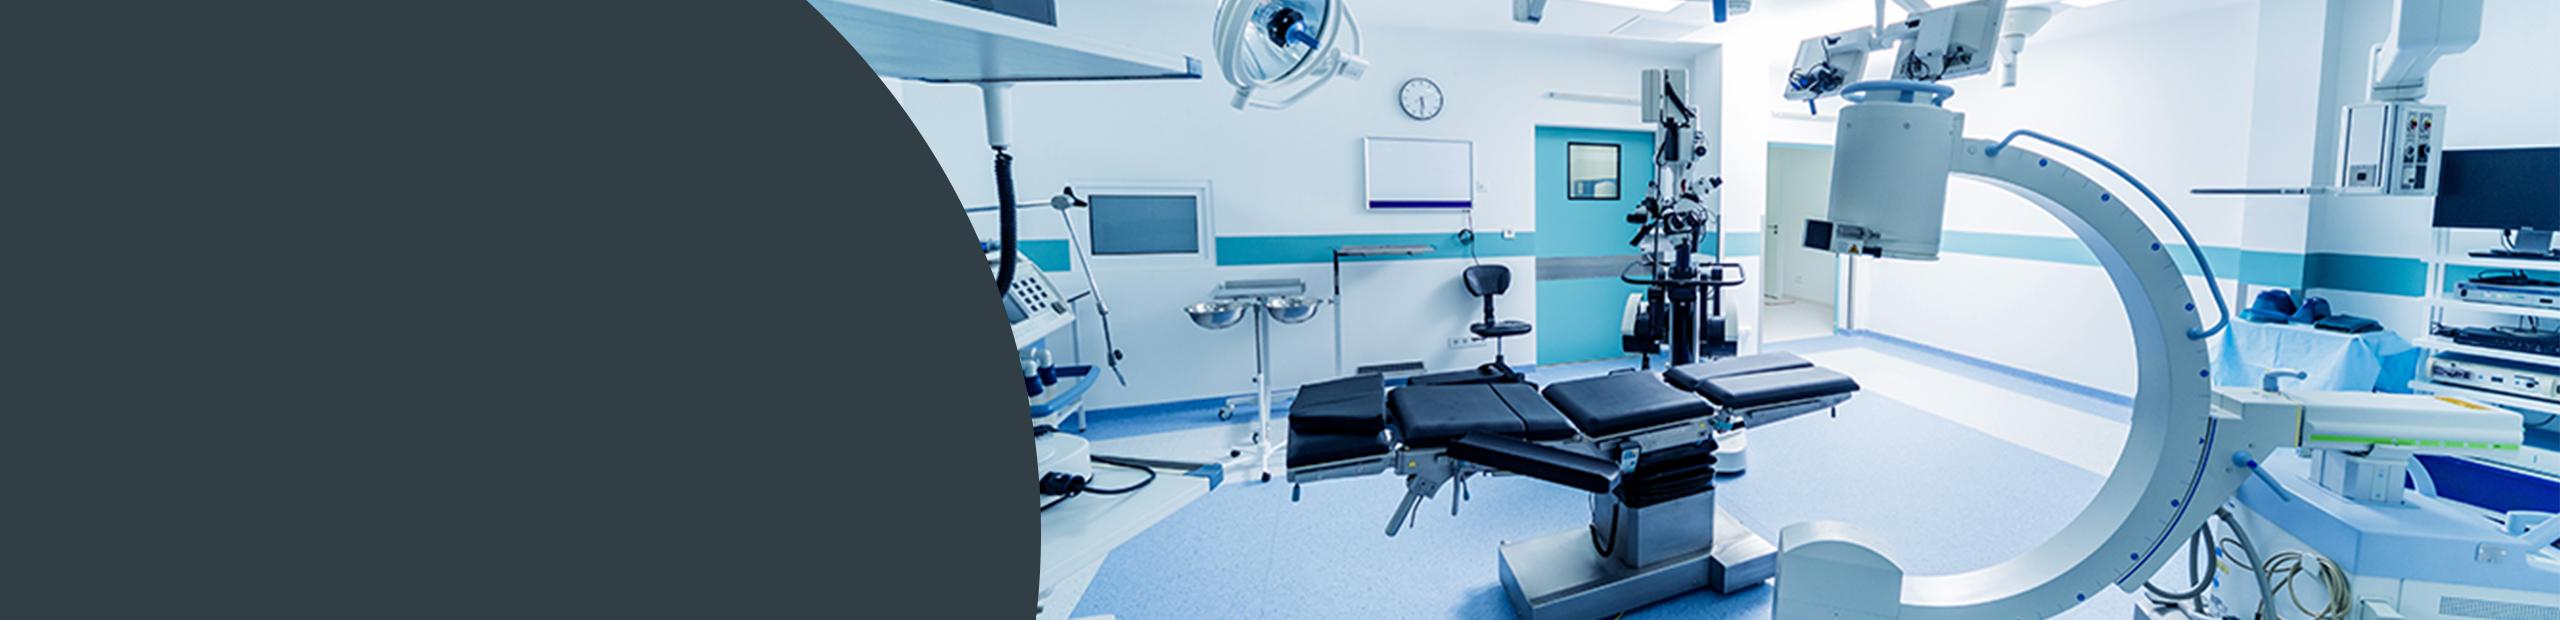 Coronavirus Decontamination Hospitals